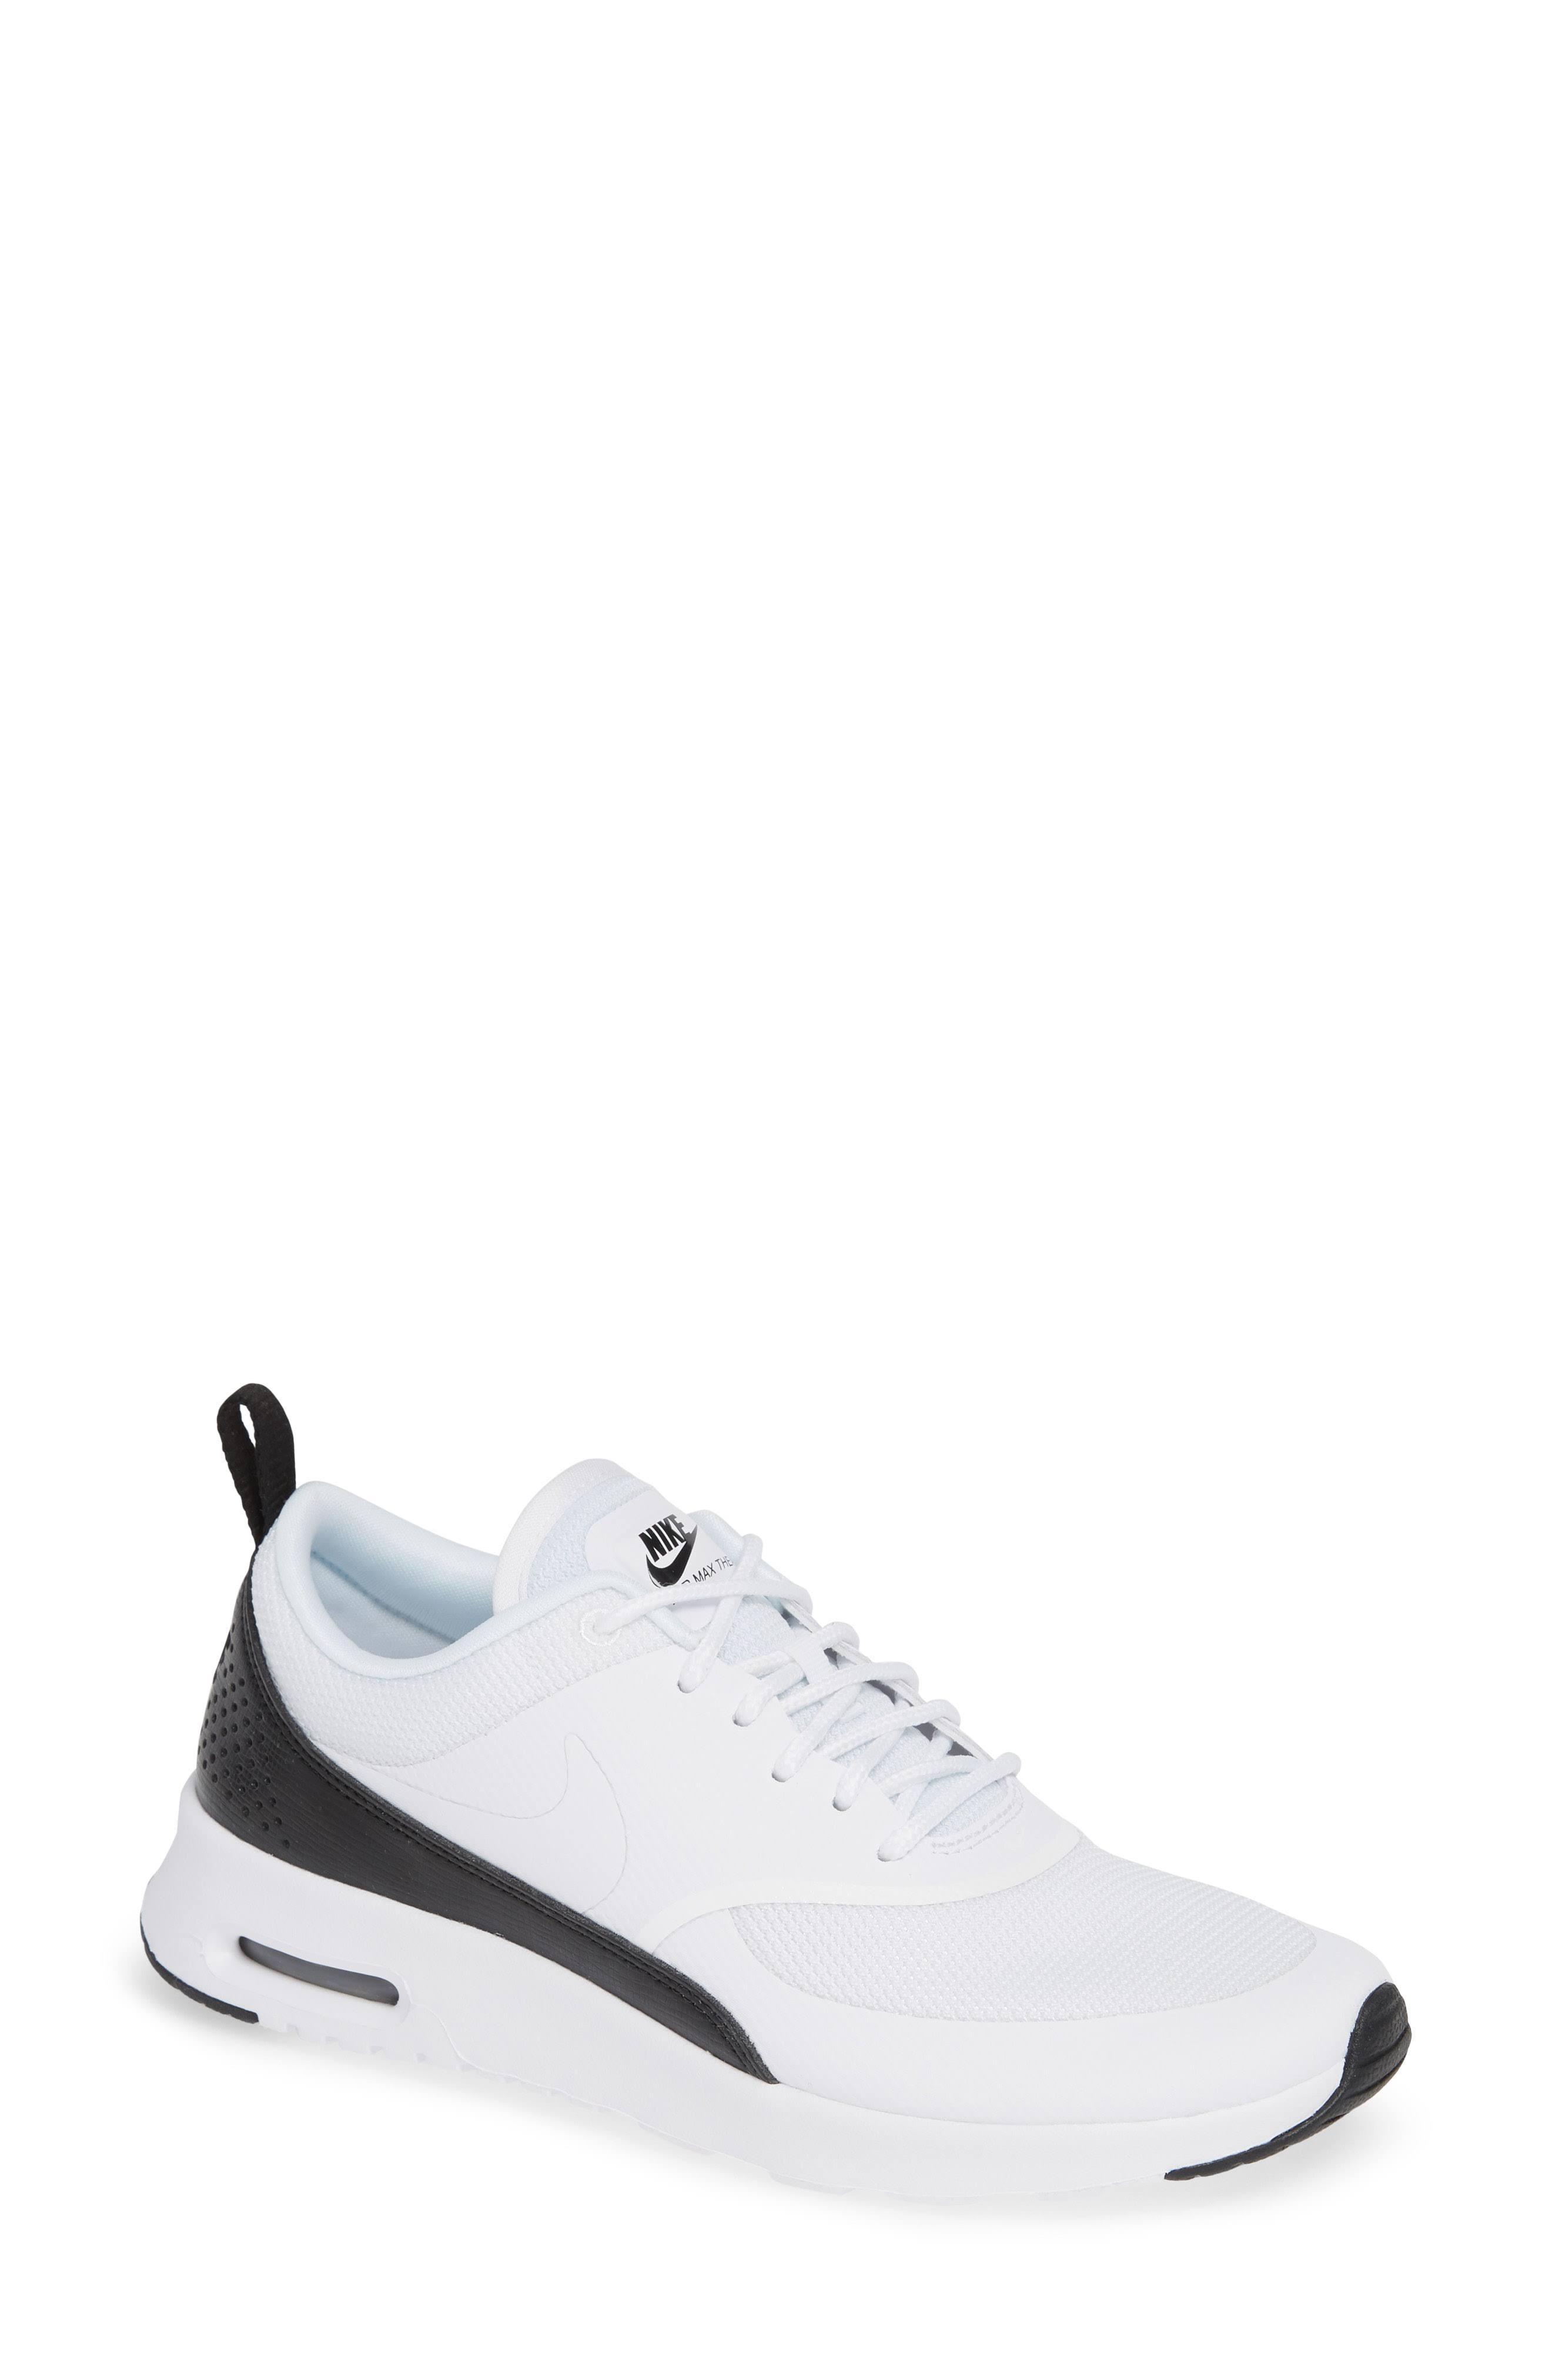 Para Thea 5 Zapatillas Mujer Max Tamaño Nike 5 Air Blanco M q0IHHAxBWw